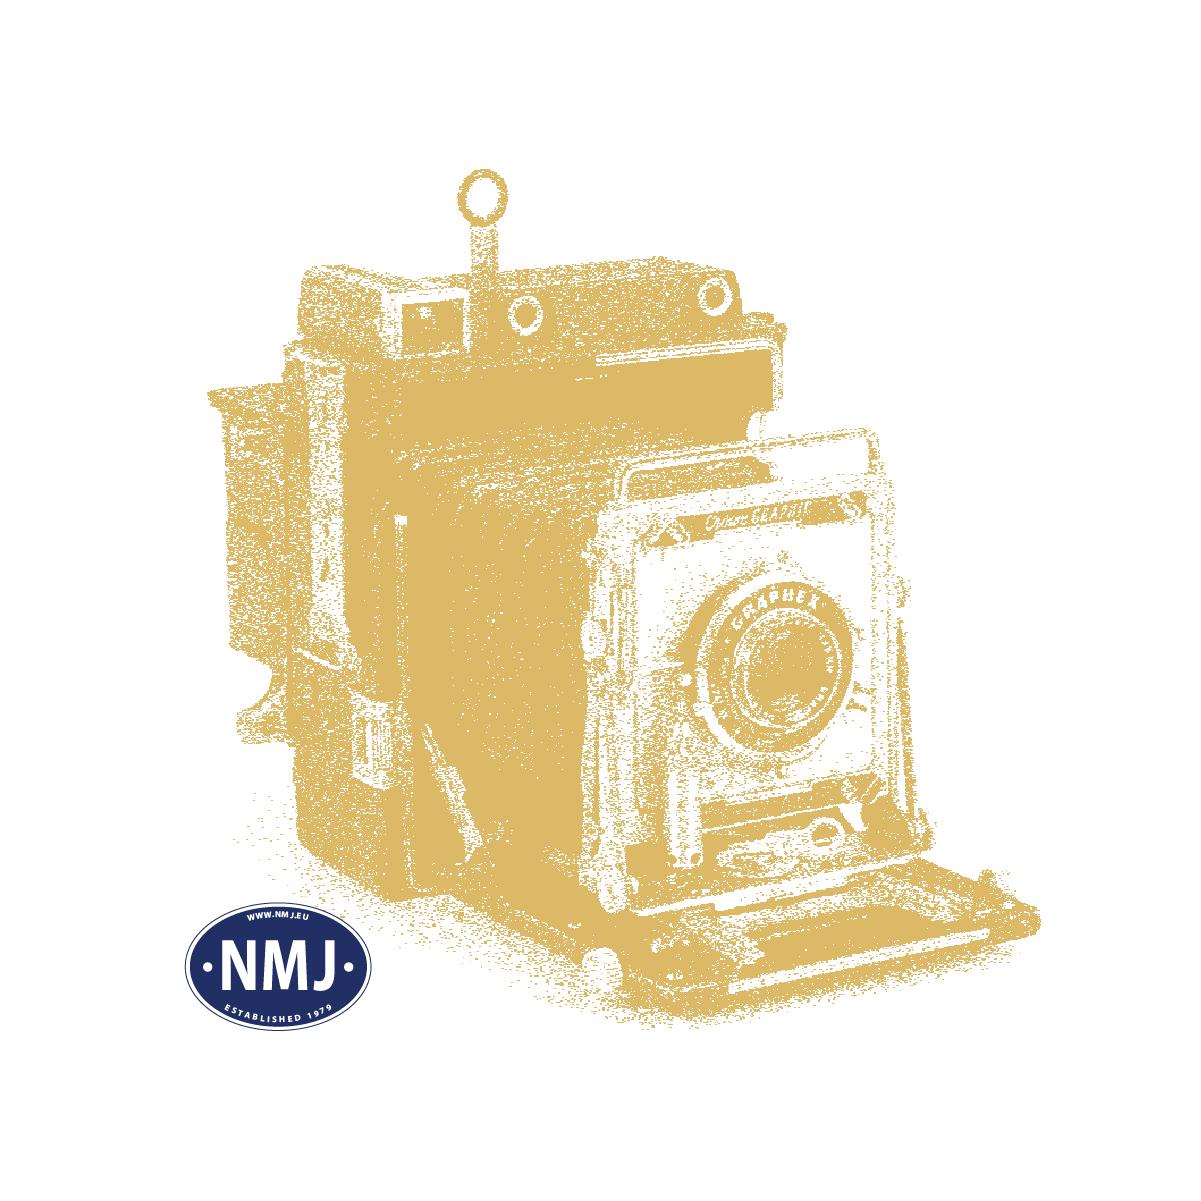 NOC58054 - Profi Steinmur